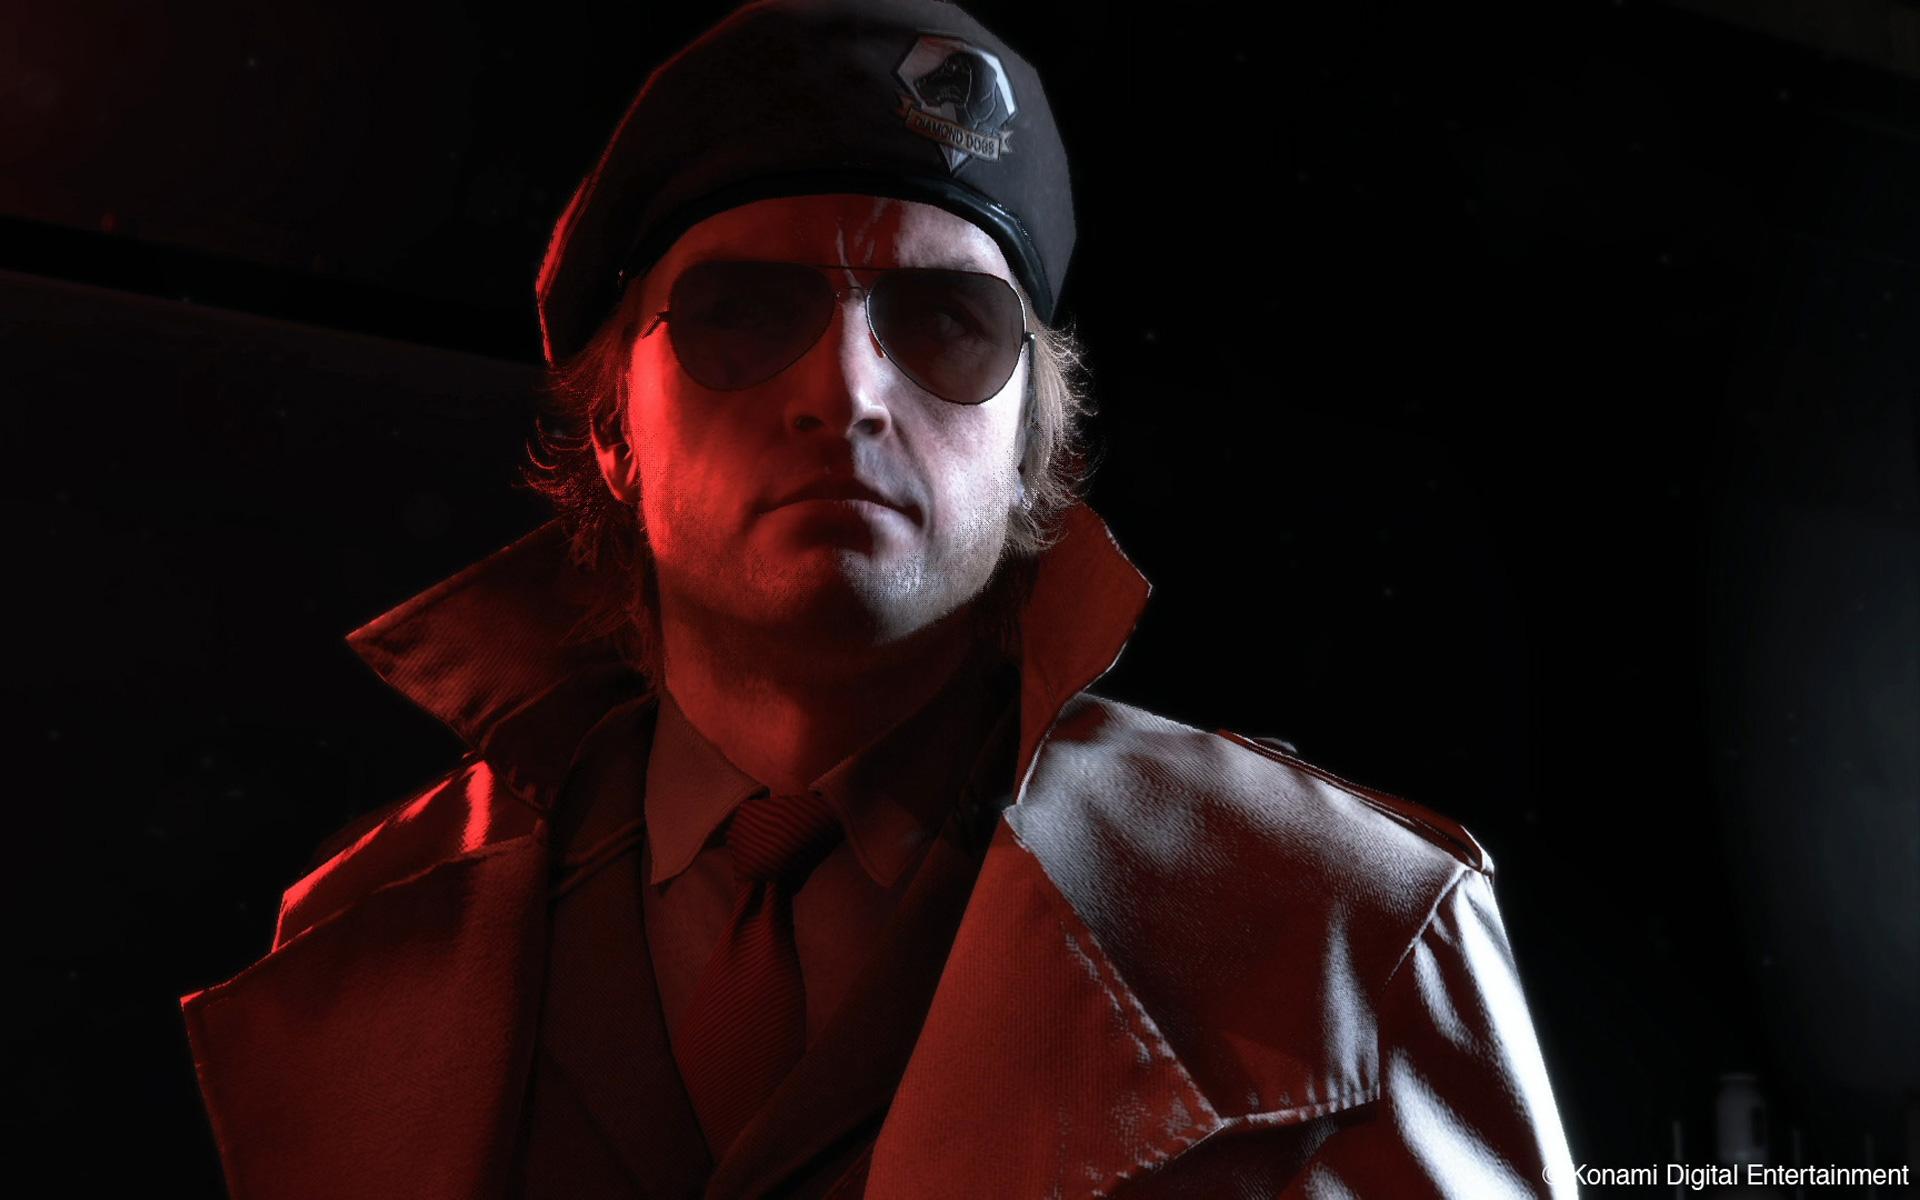 Free Metal Gear Solid V: The Phantom Pain Wallpaper in 1920x1200